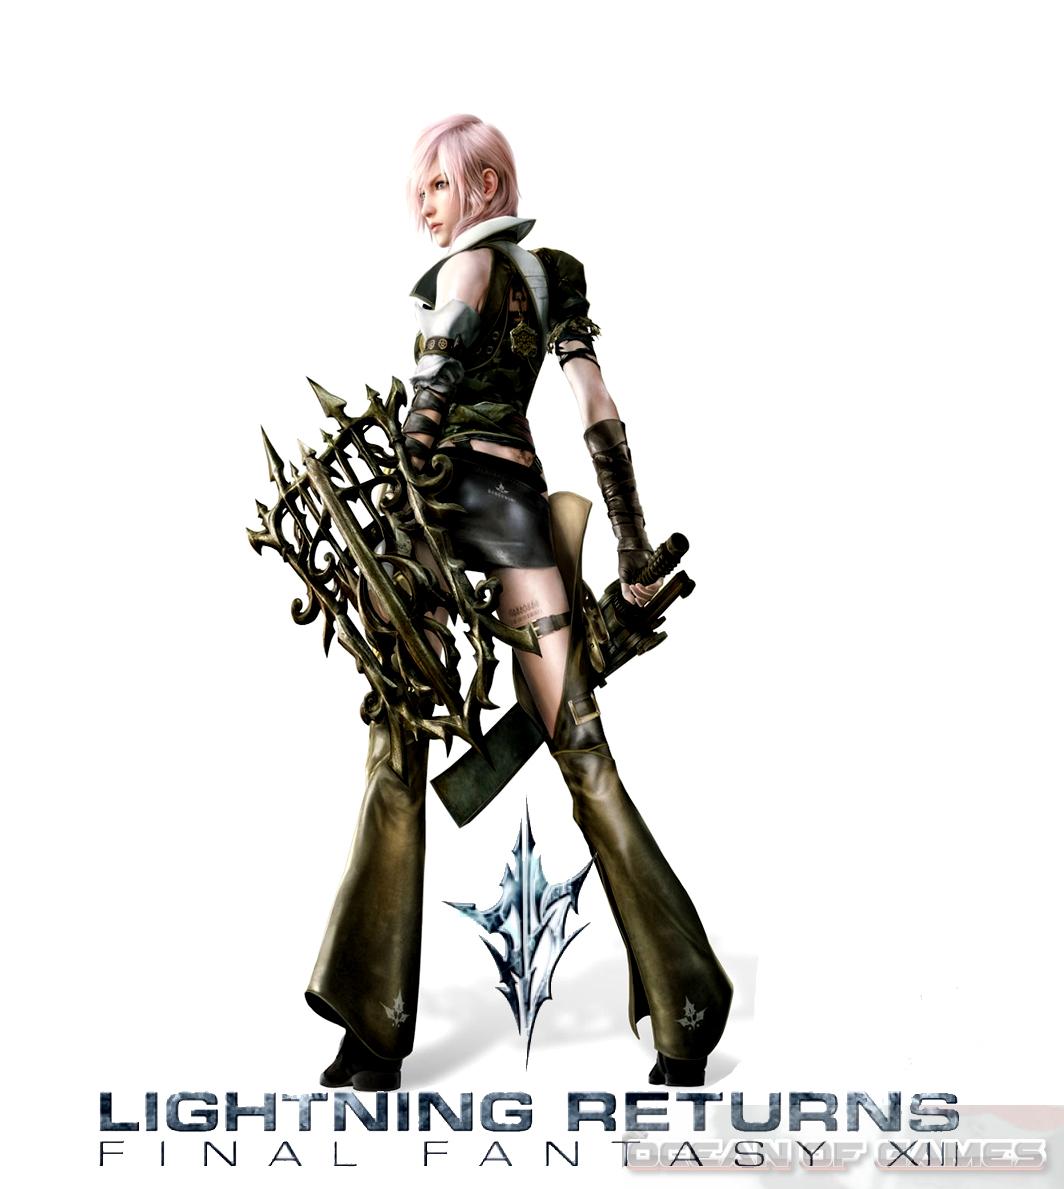 Lightning Returns Final Fantasy XIII Free Download